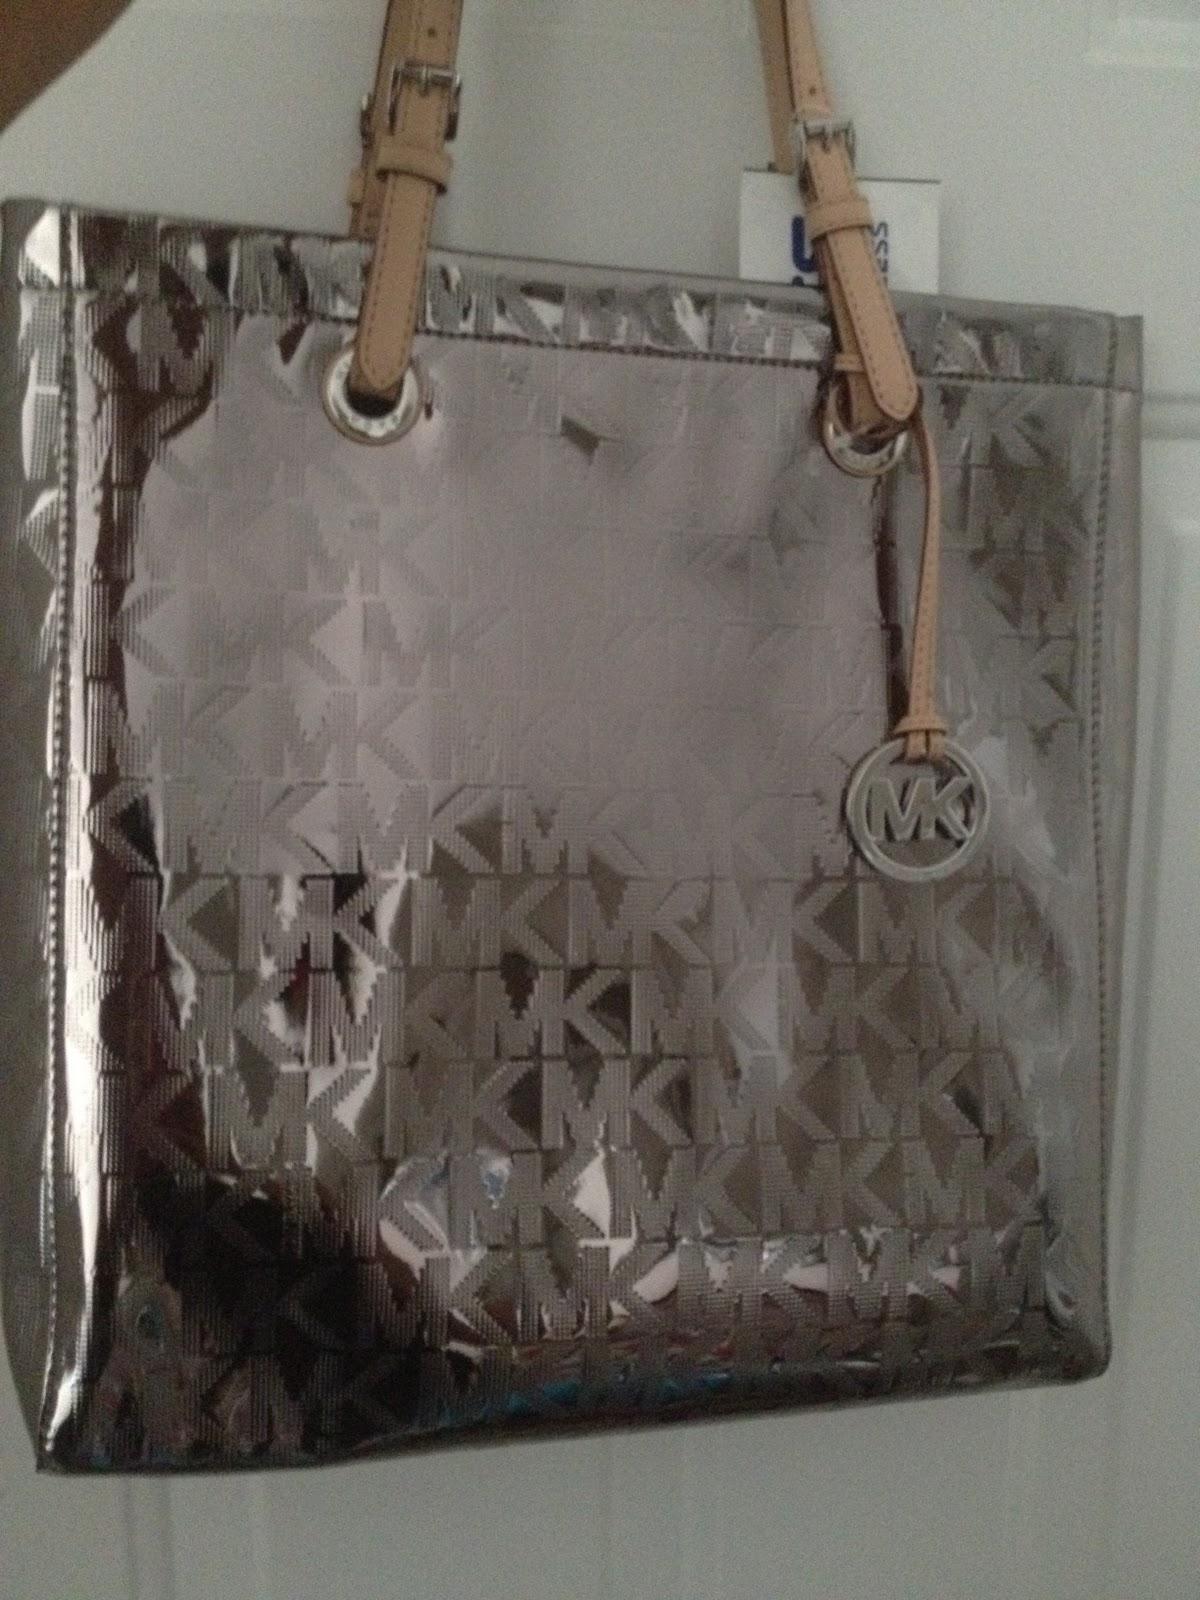 b3cc8c2628d1 Michael Kors bag from Ross